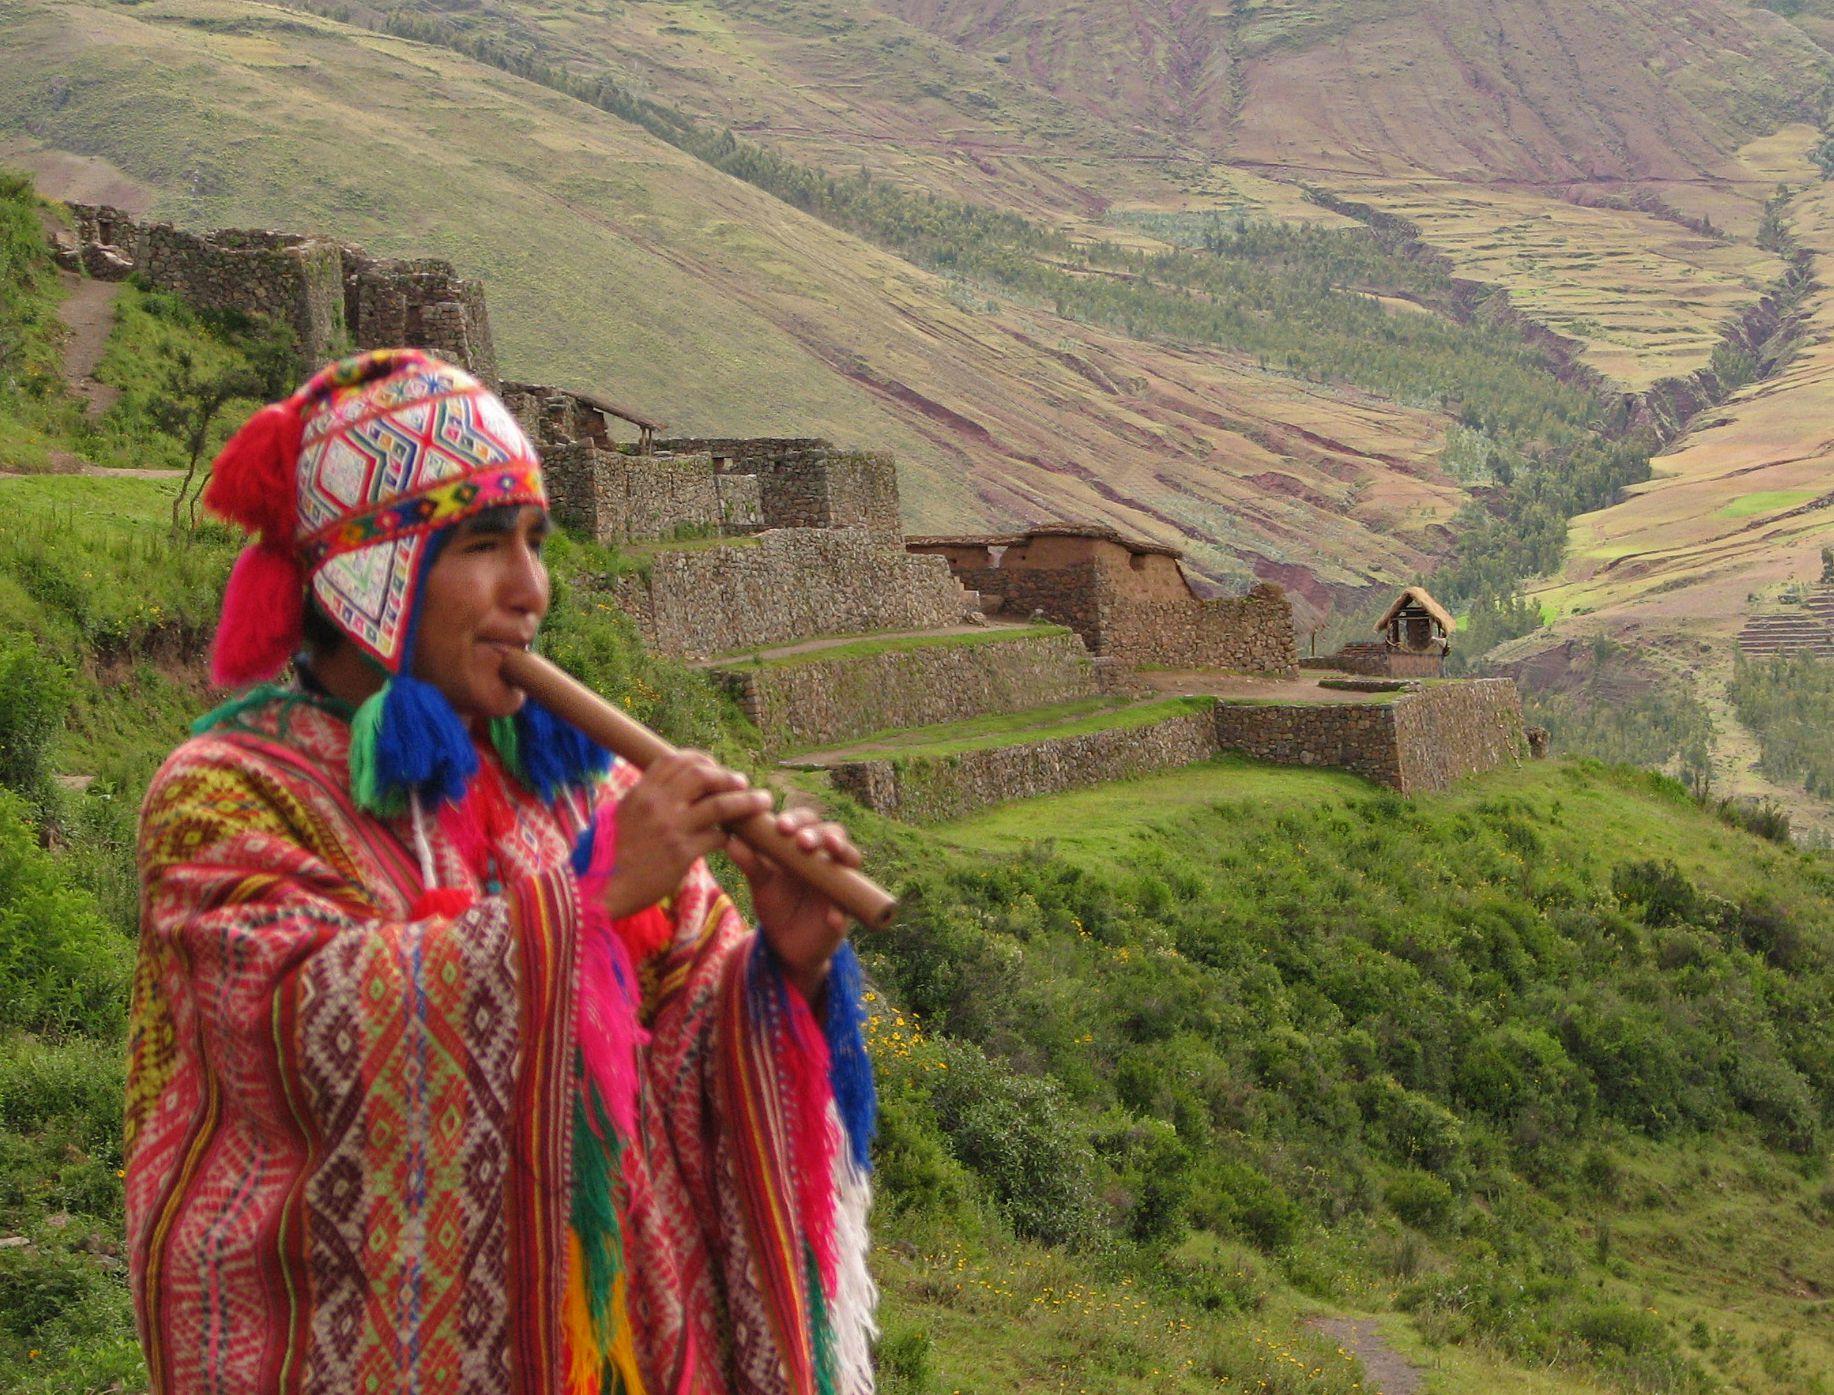 معلومات عن حضارة الانكا The-Inca-Empire-or-Inka-Empire-was-the-largest-empire-in-pre-Columbian-America